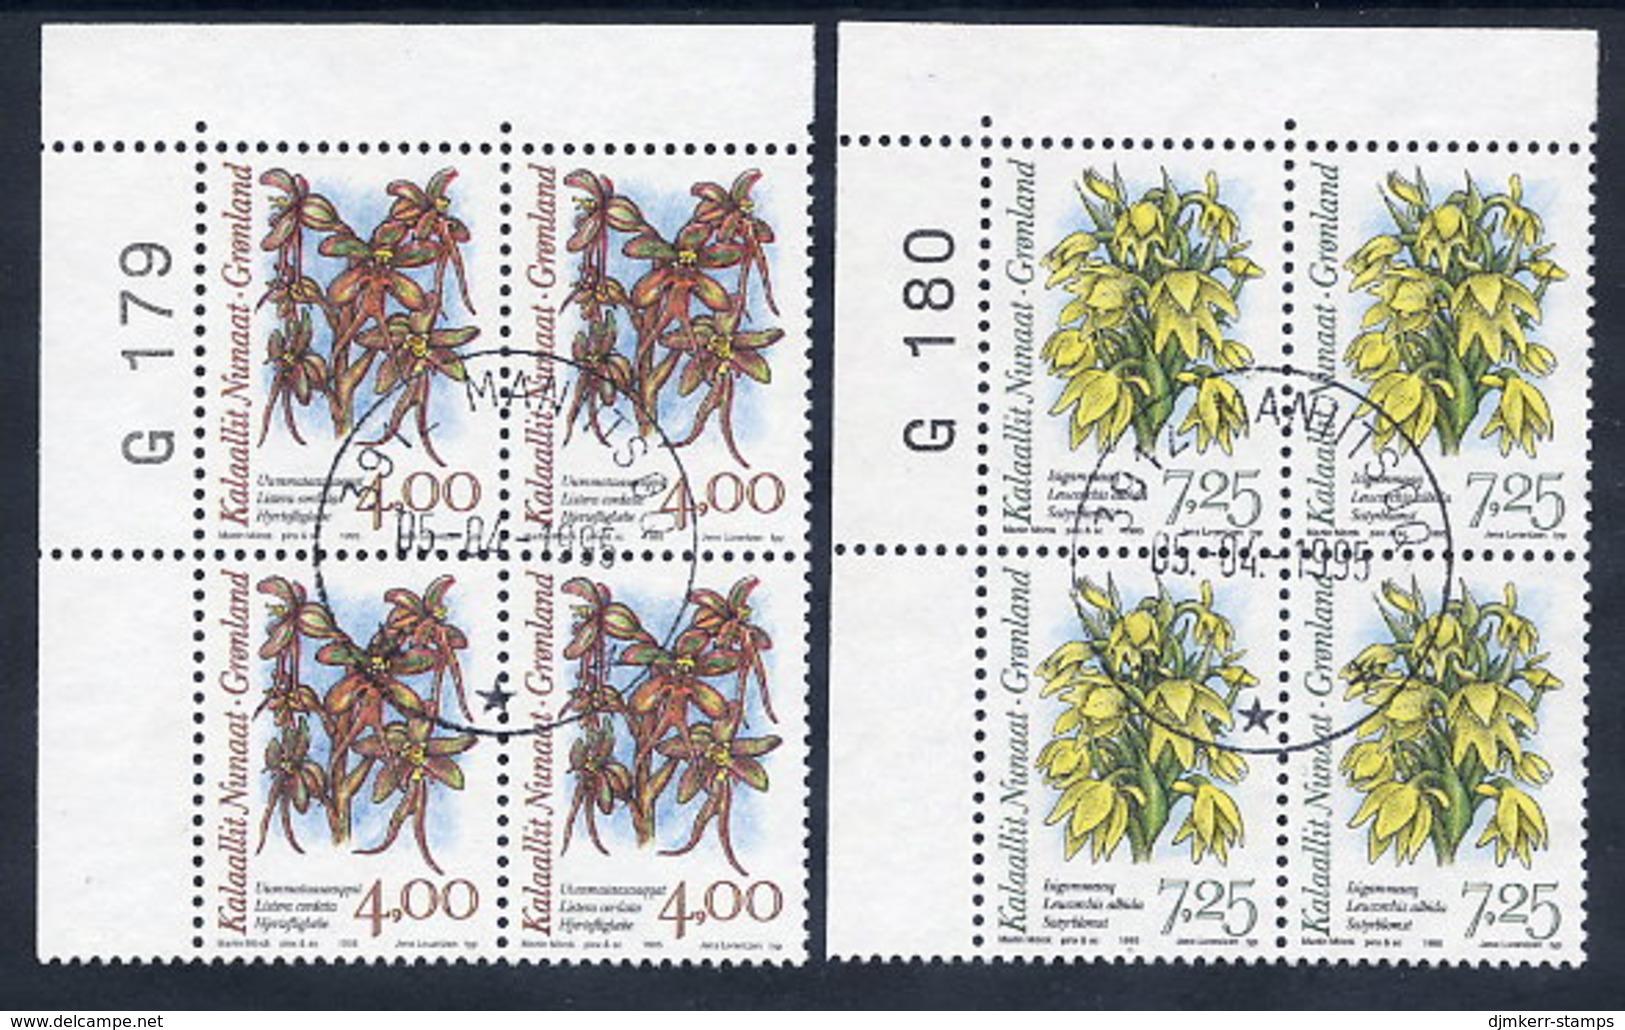 GREENLAND 1995 Arctic Orchids Iin Used Corner Blocks Of 4.  Michel 256-57 - Greenland